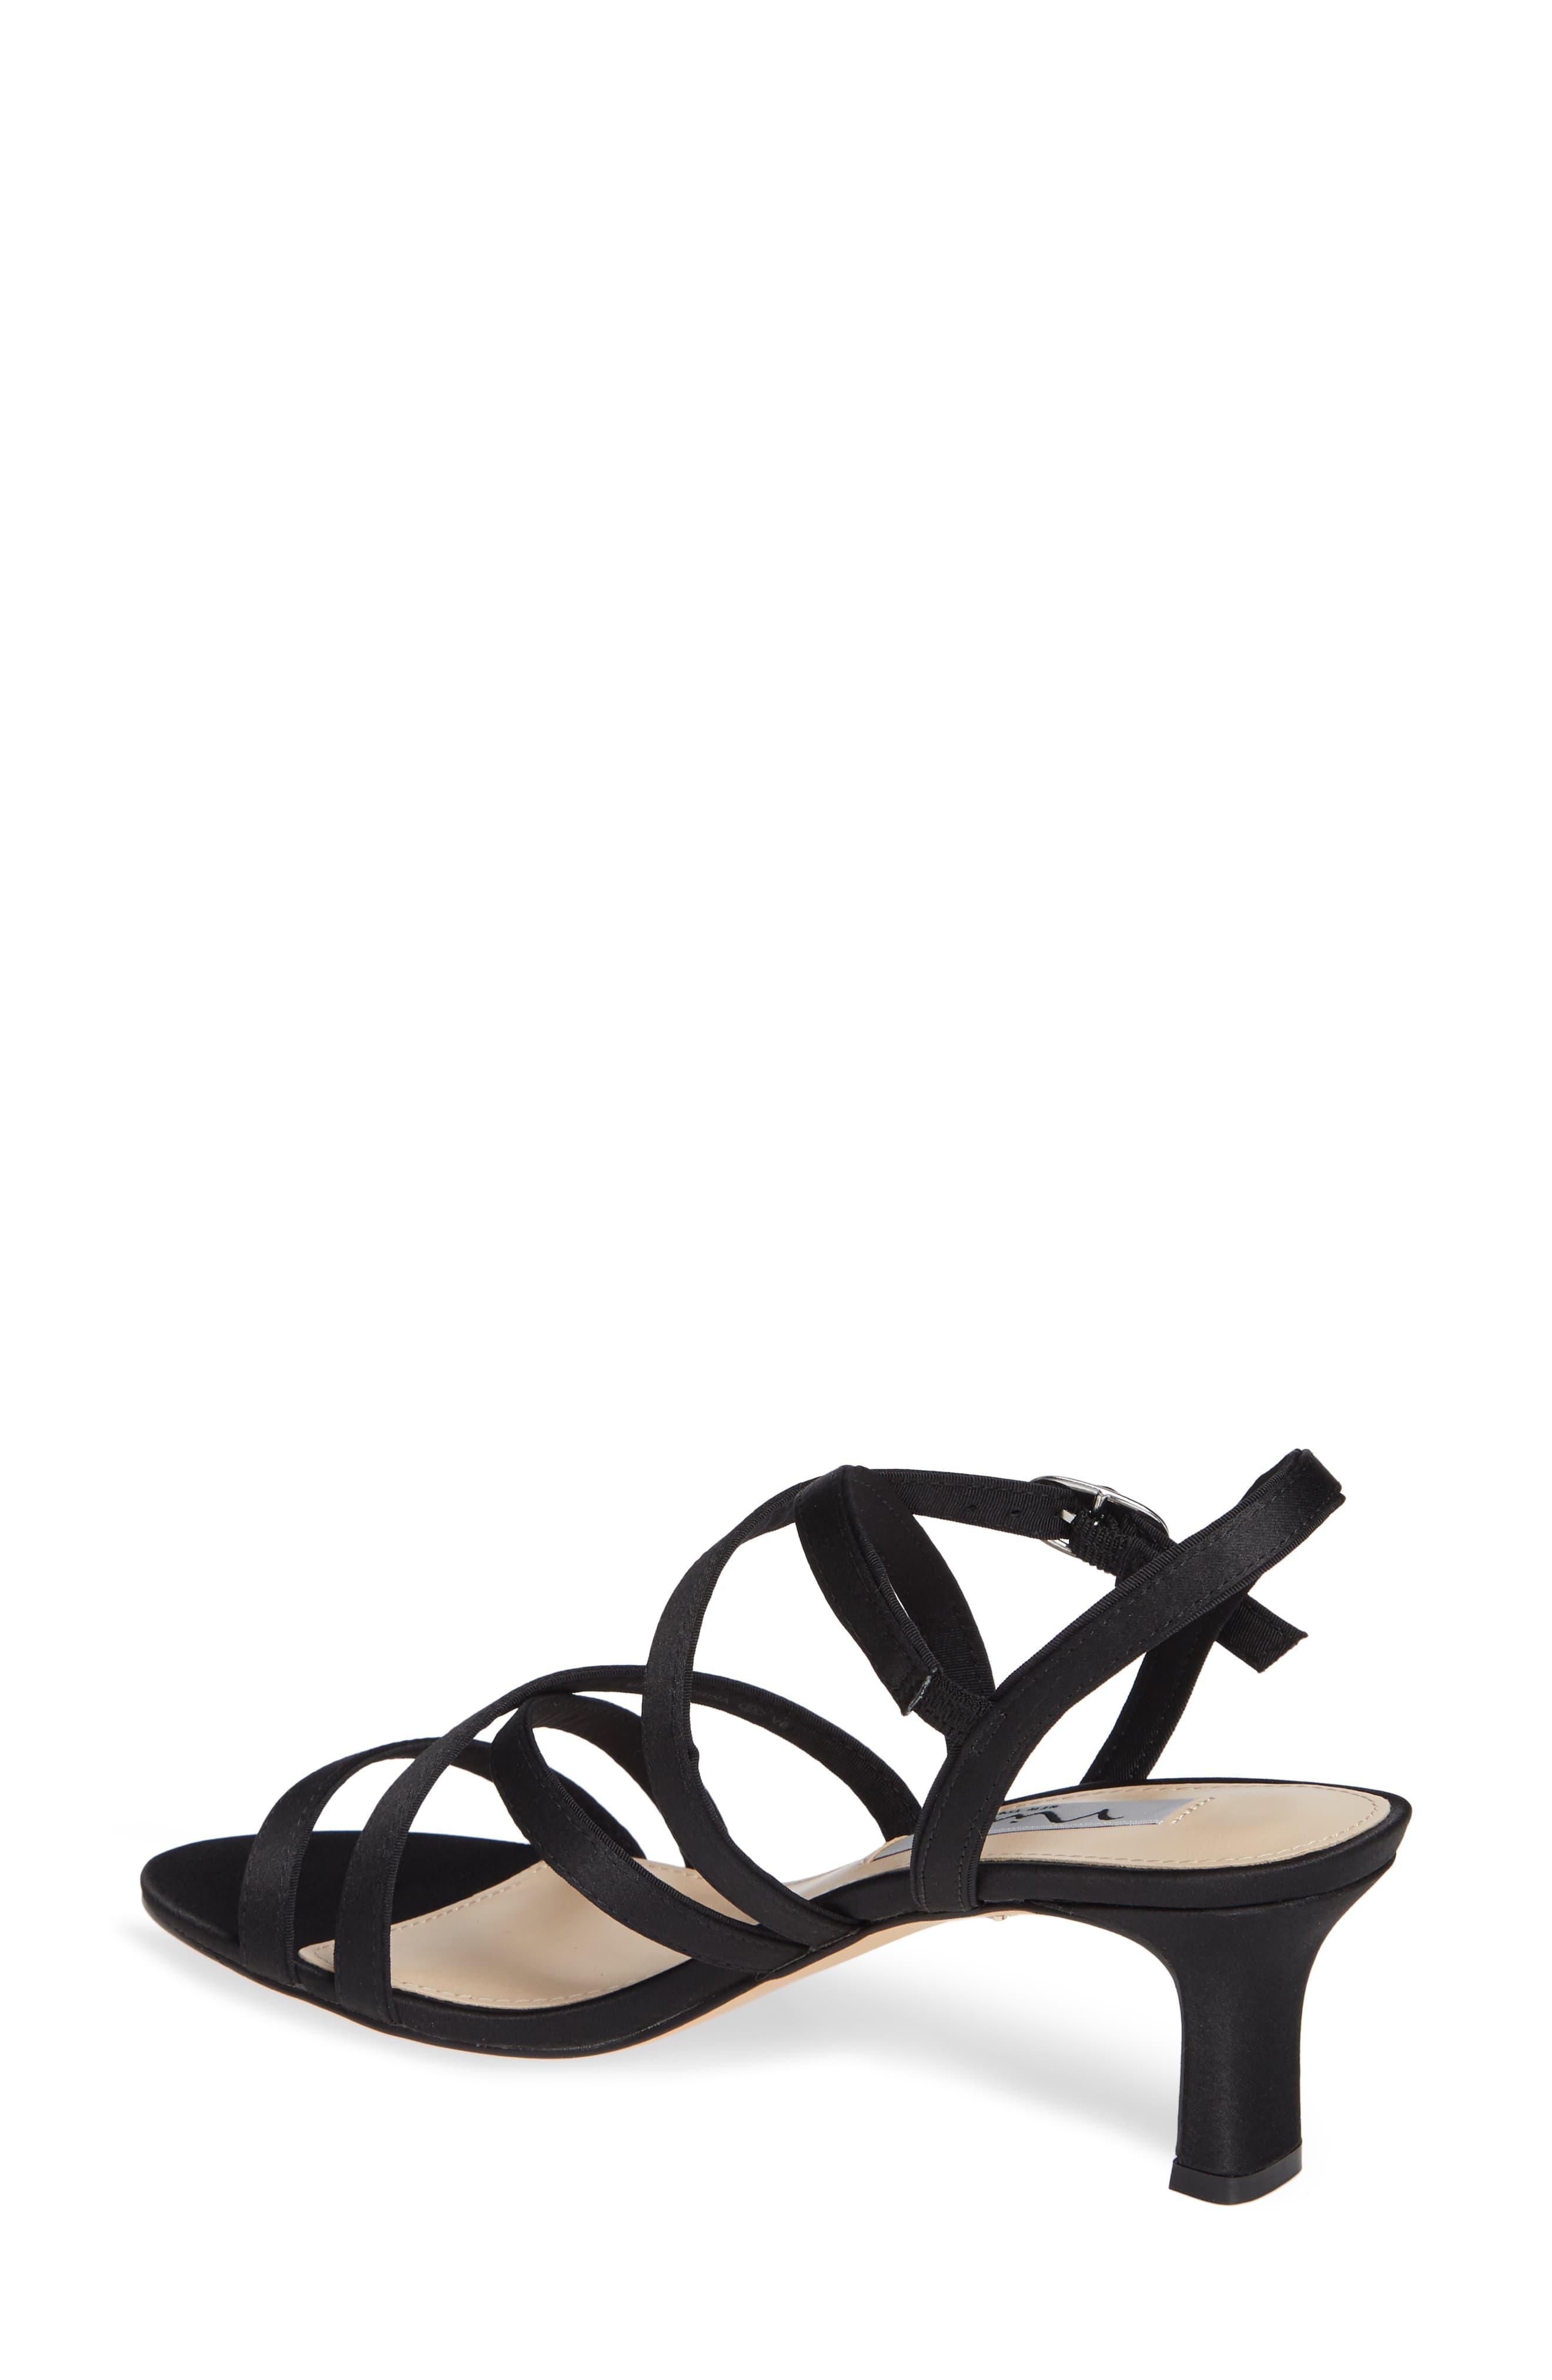 c6b6208d0 Nina Genaya Strappy Evening Sandal in Black - Save 33% - Lyst